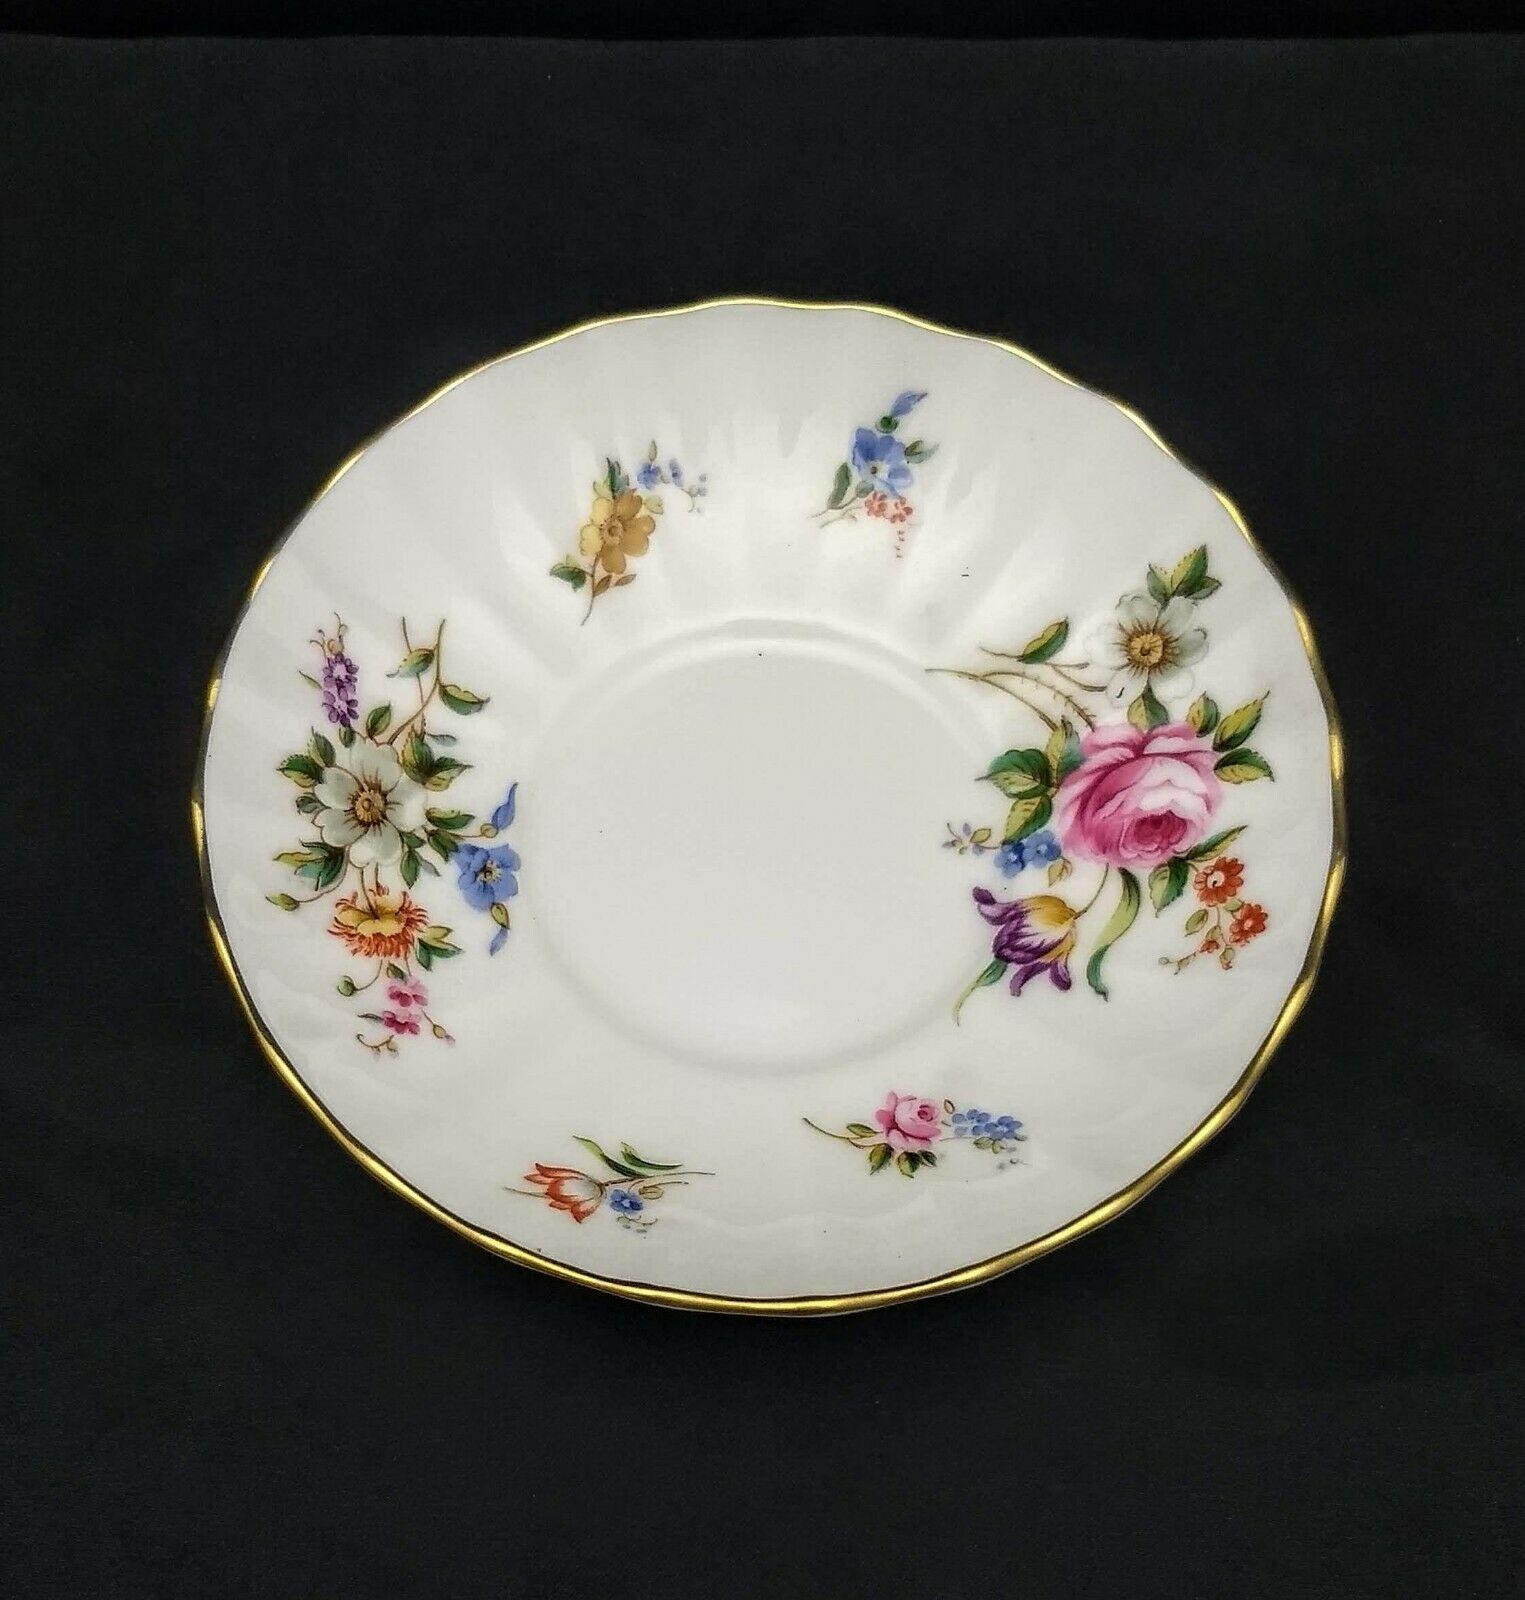 Royal Worcester Fine Bone China Roanoke Pattern Demitasse Cup & Saucer